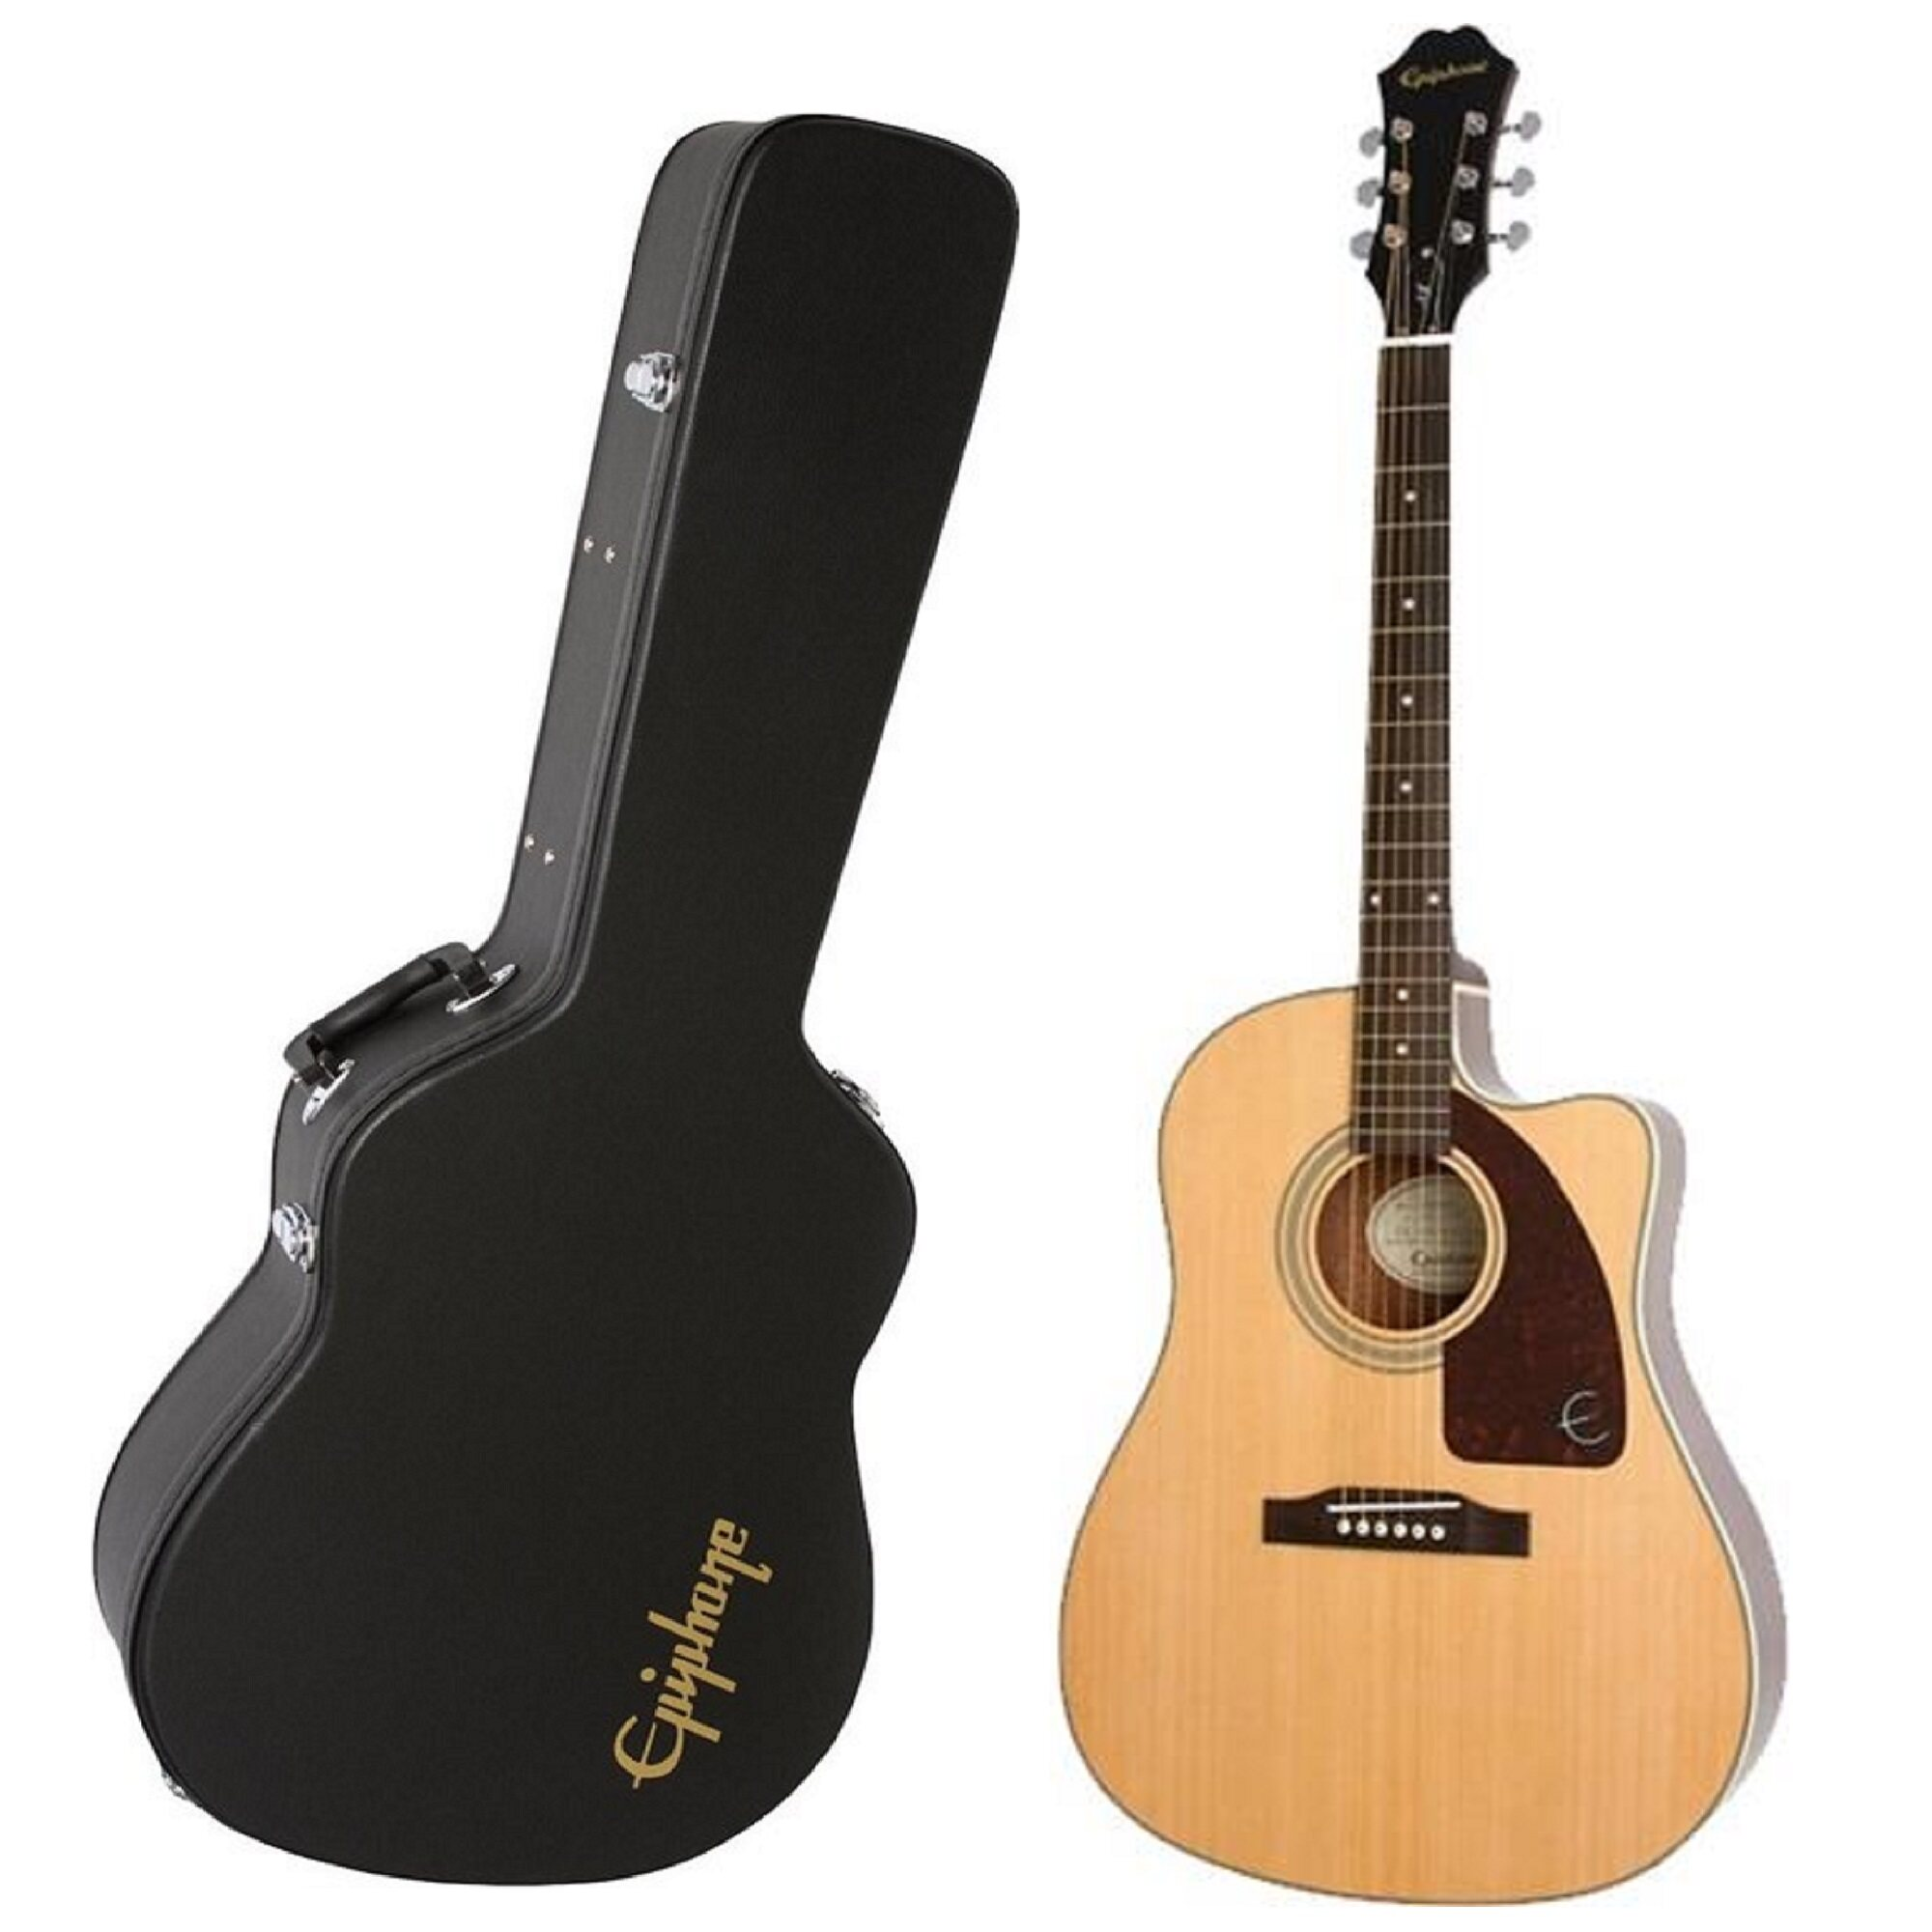 AJ-210CE Acoustic//Electric Outfit Natural